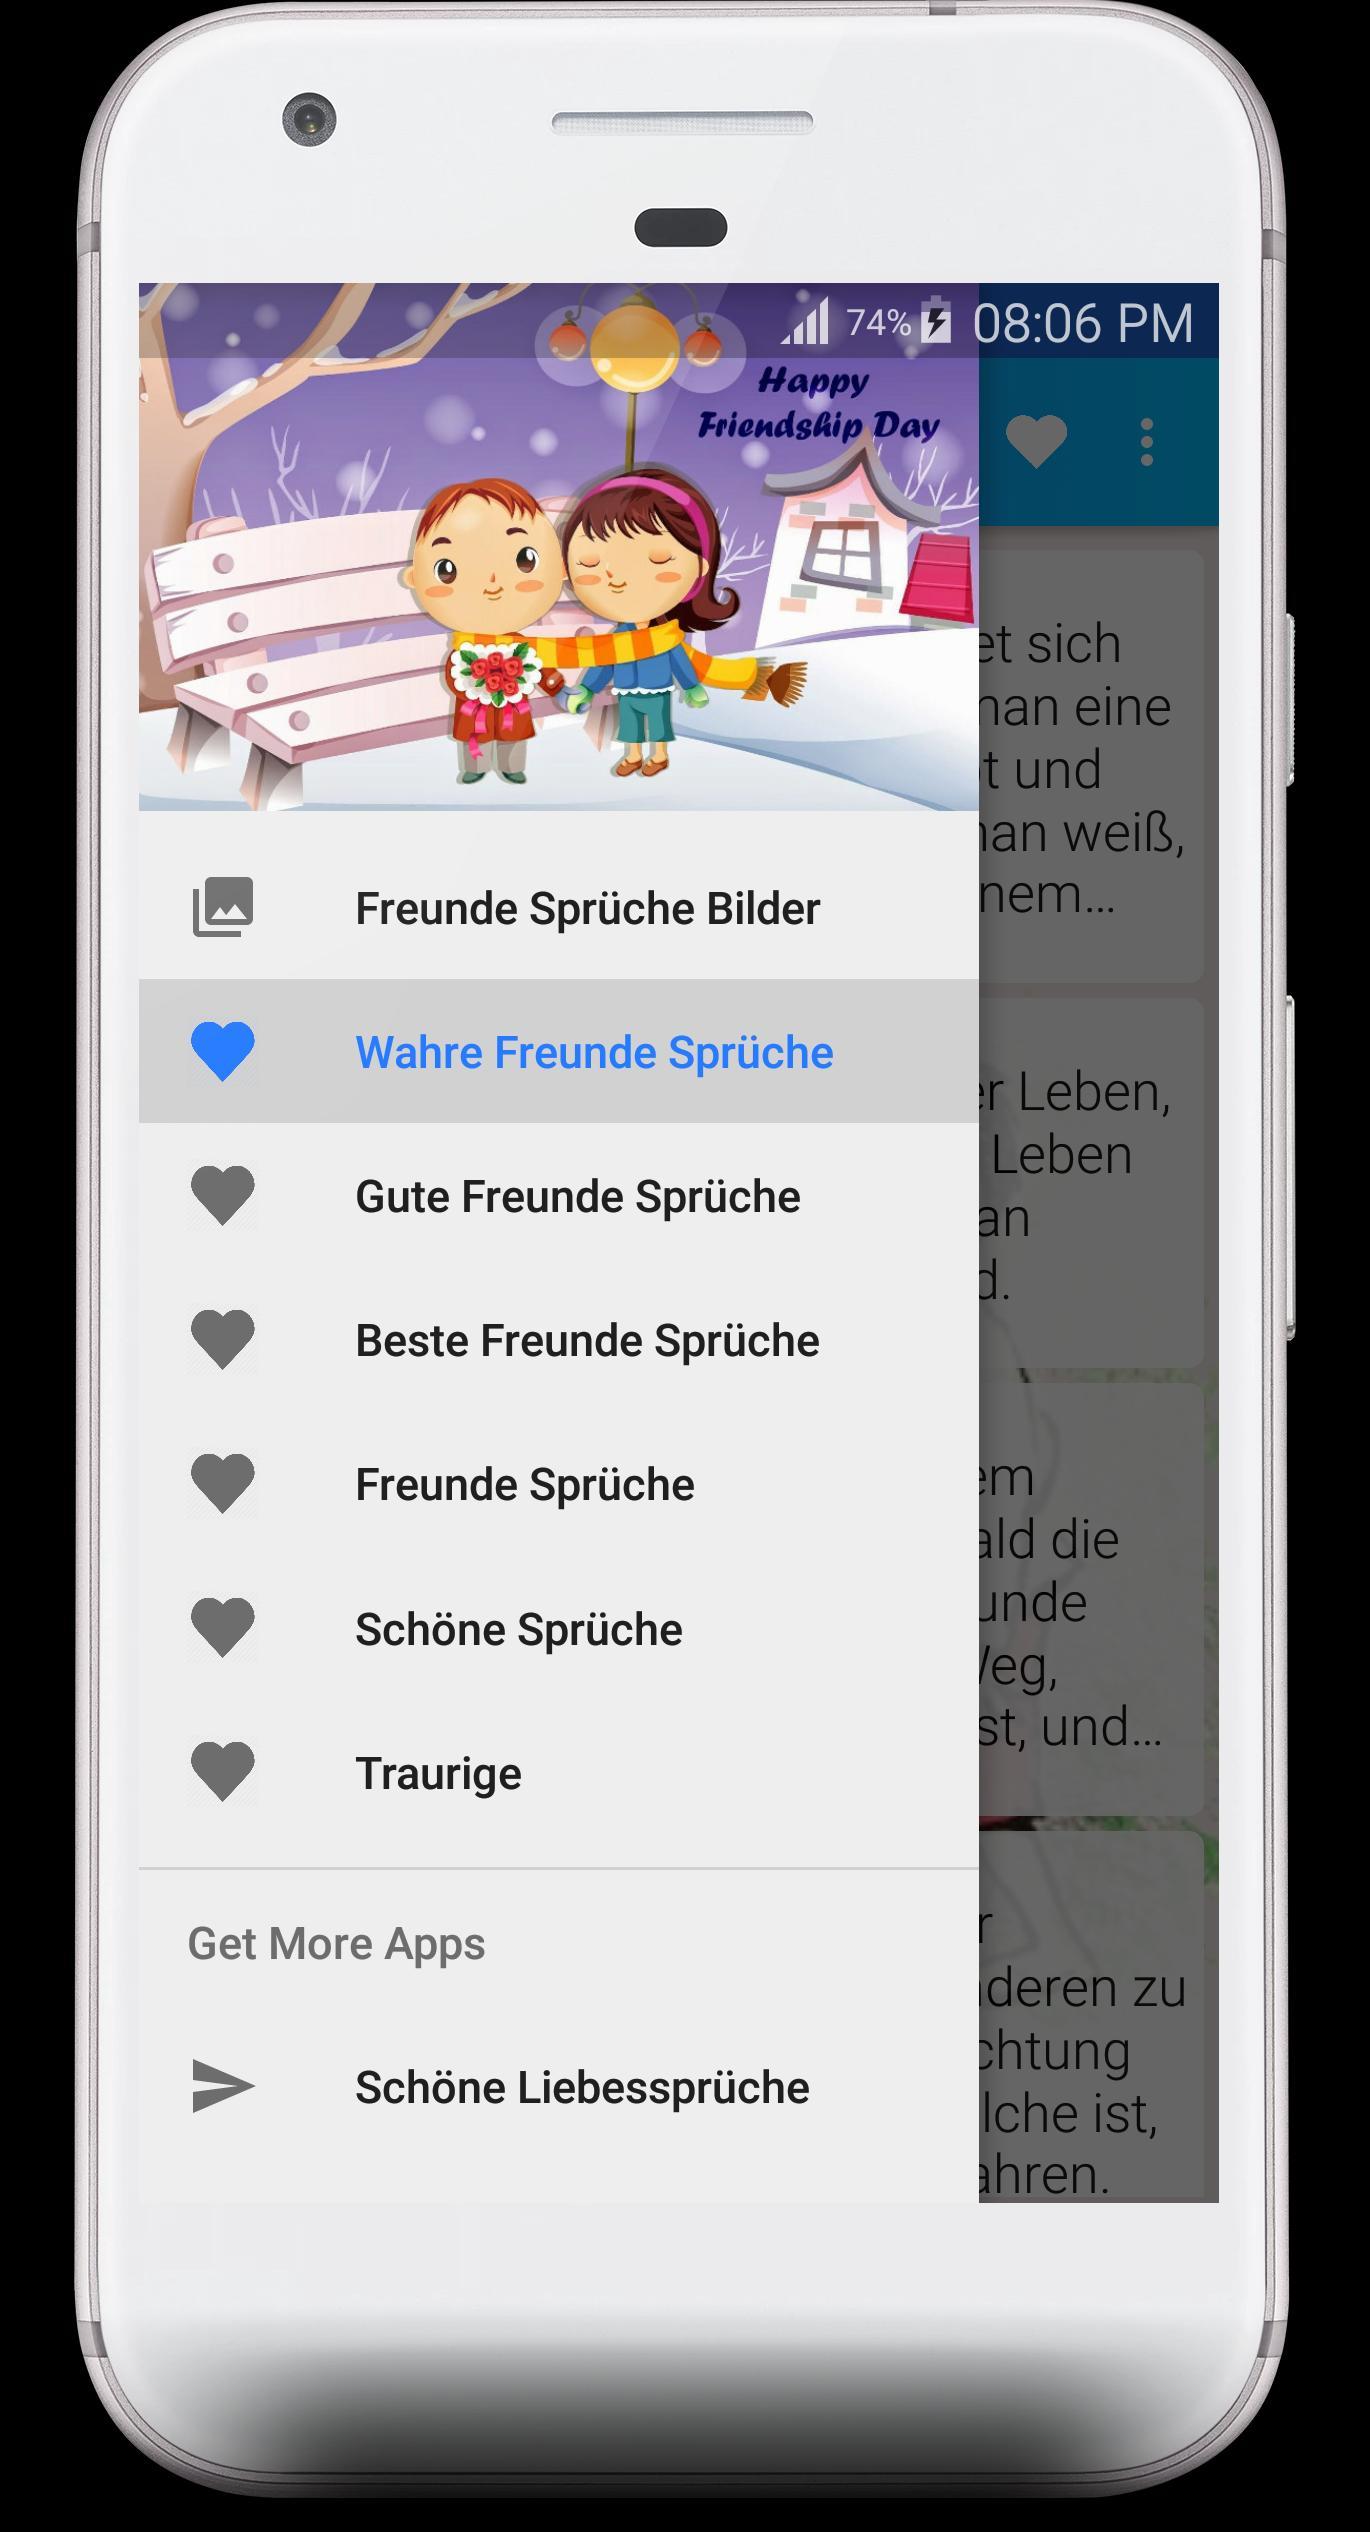 Freundschaft Sprüche для андроид скачать Apk